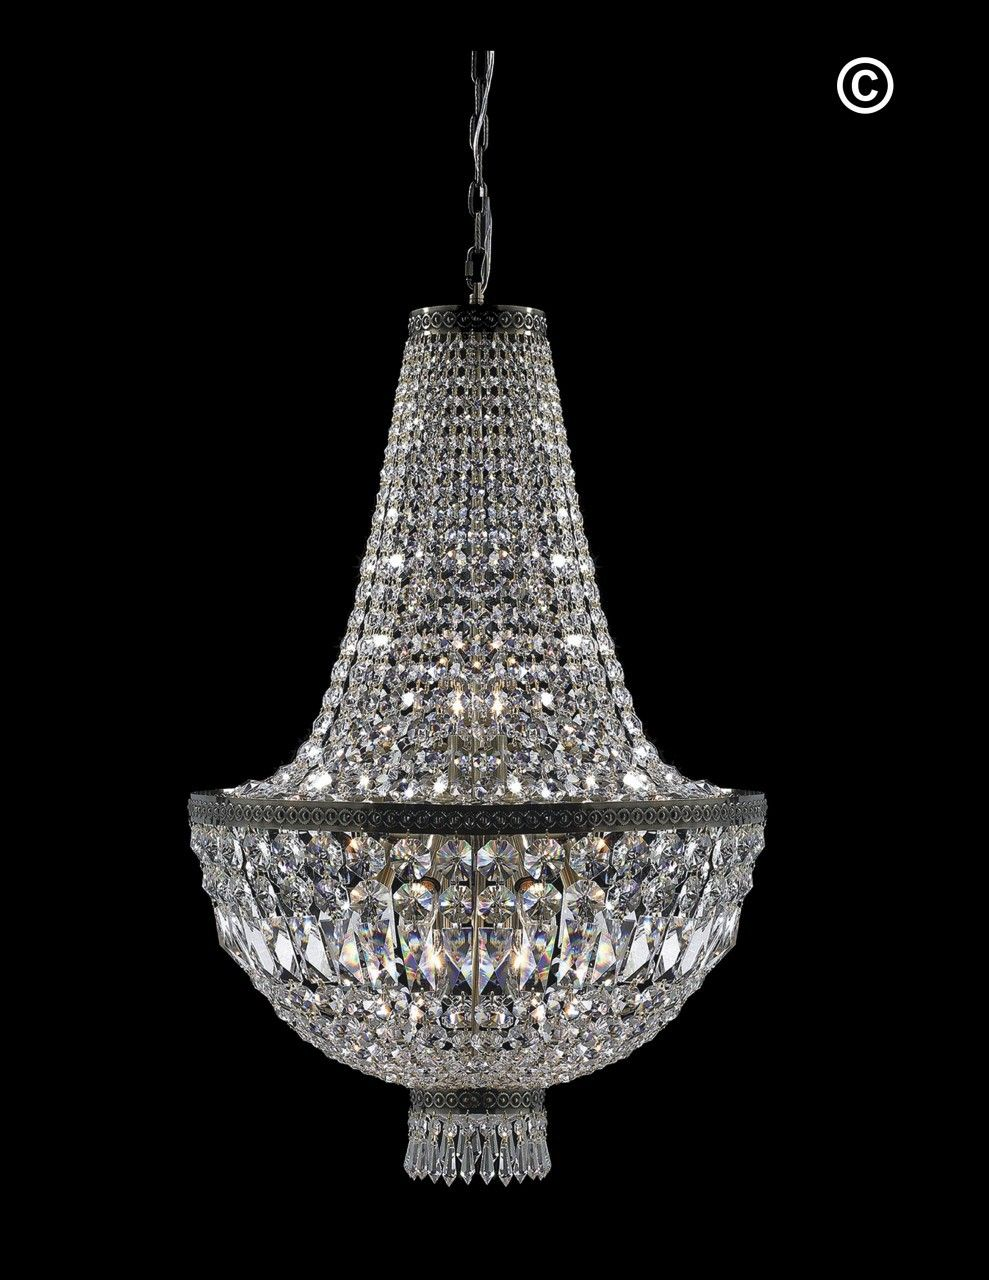 French Basket Chandelier Antique Bronze 8 Light Designer Australia Pty Ltd